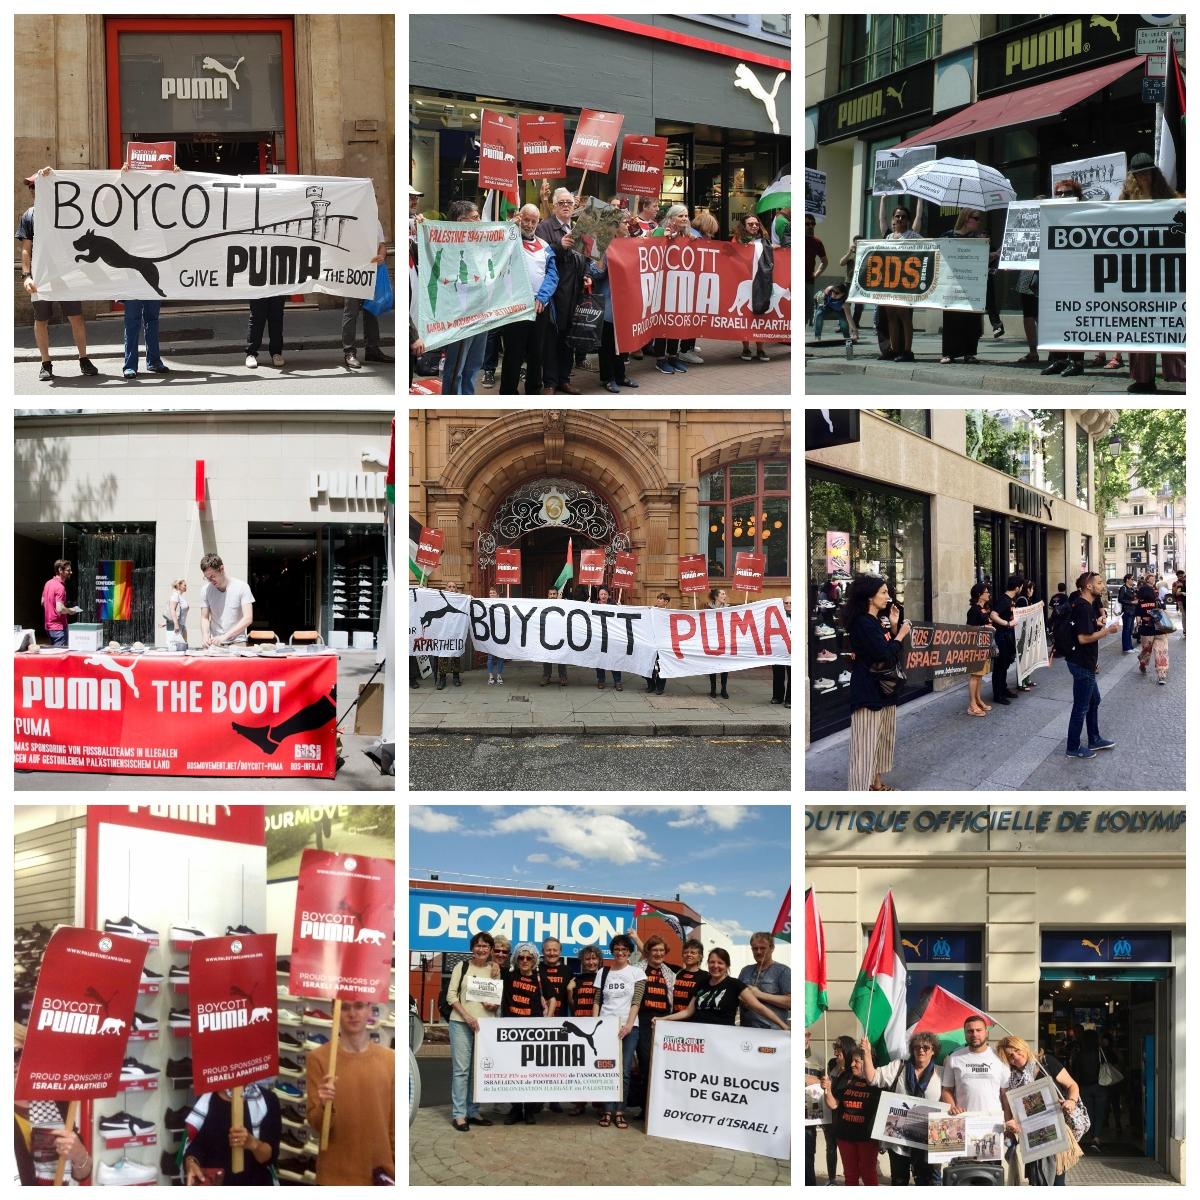 Boycott Puma Global Day of Action